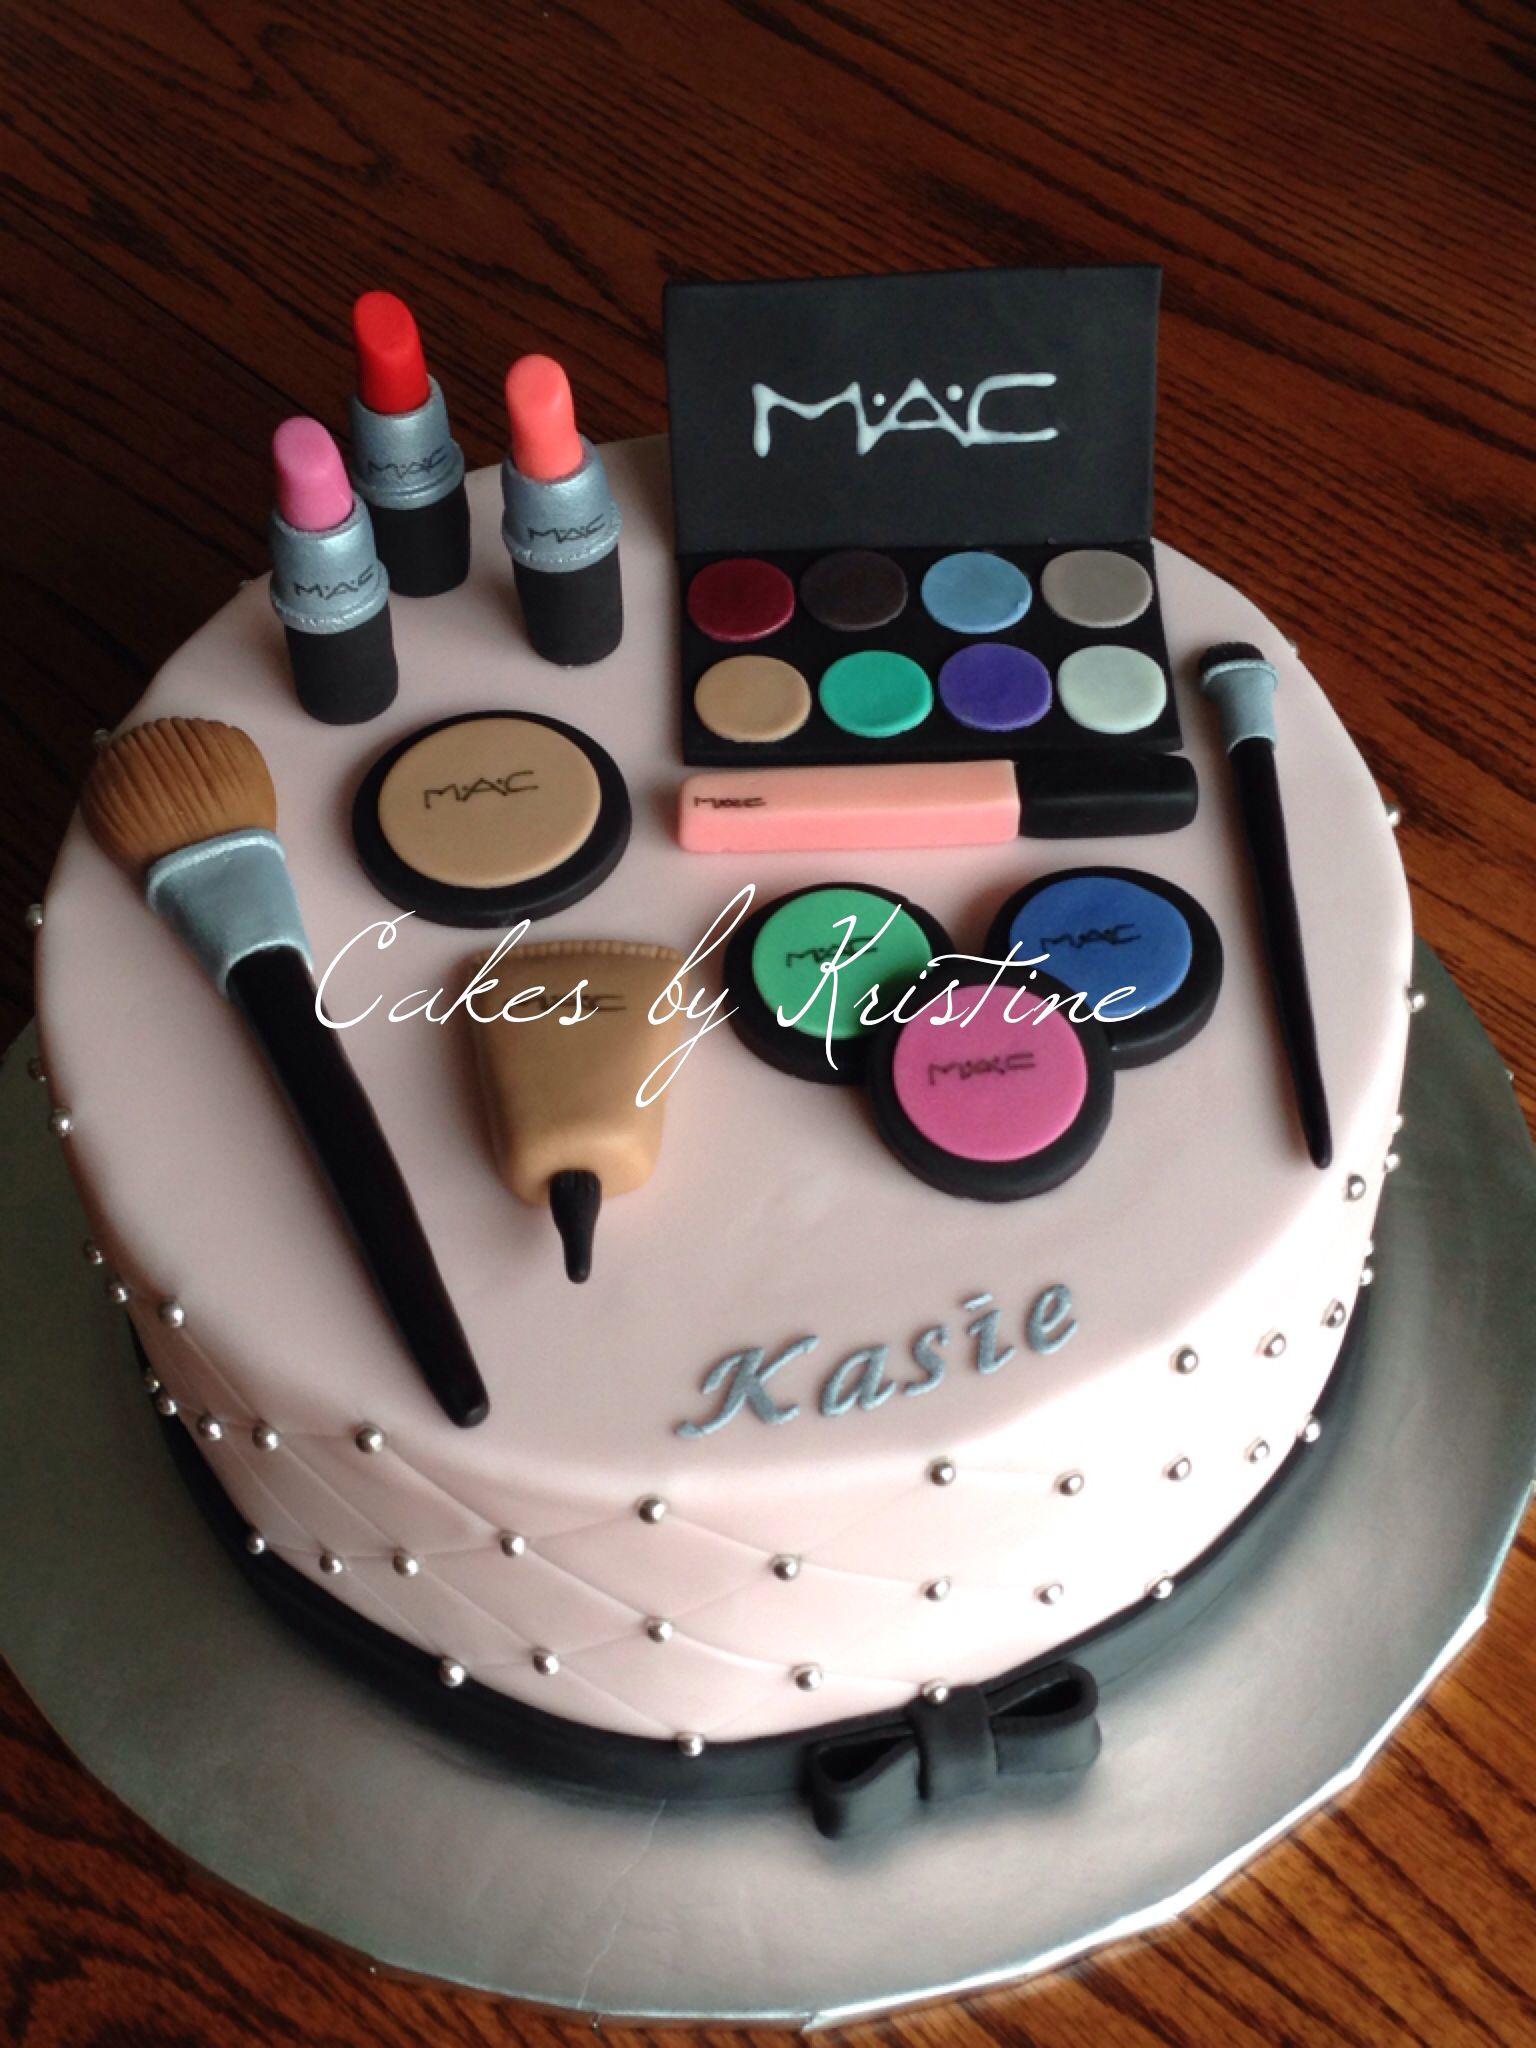 Wondrous Mac Makeup Cake Con Immagini Torte Trucco Torta Mac Torte Personalised Birthday Cards Sponlily Jamesorg